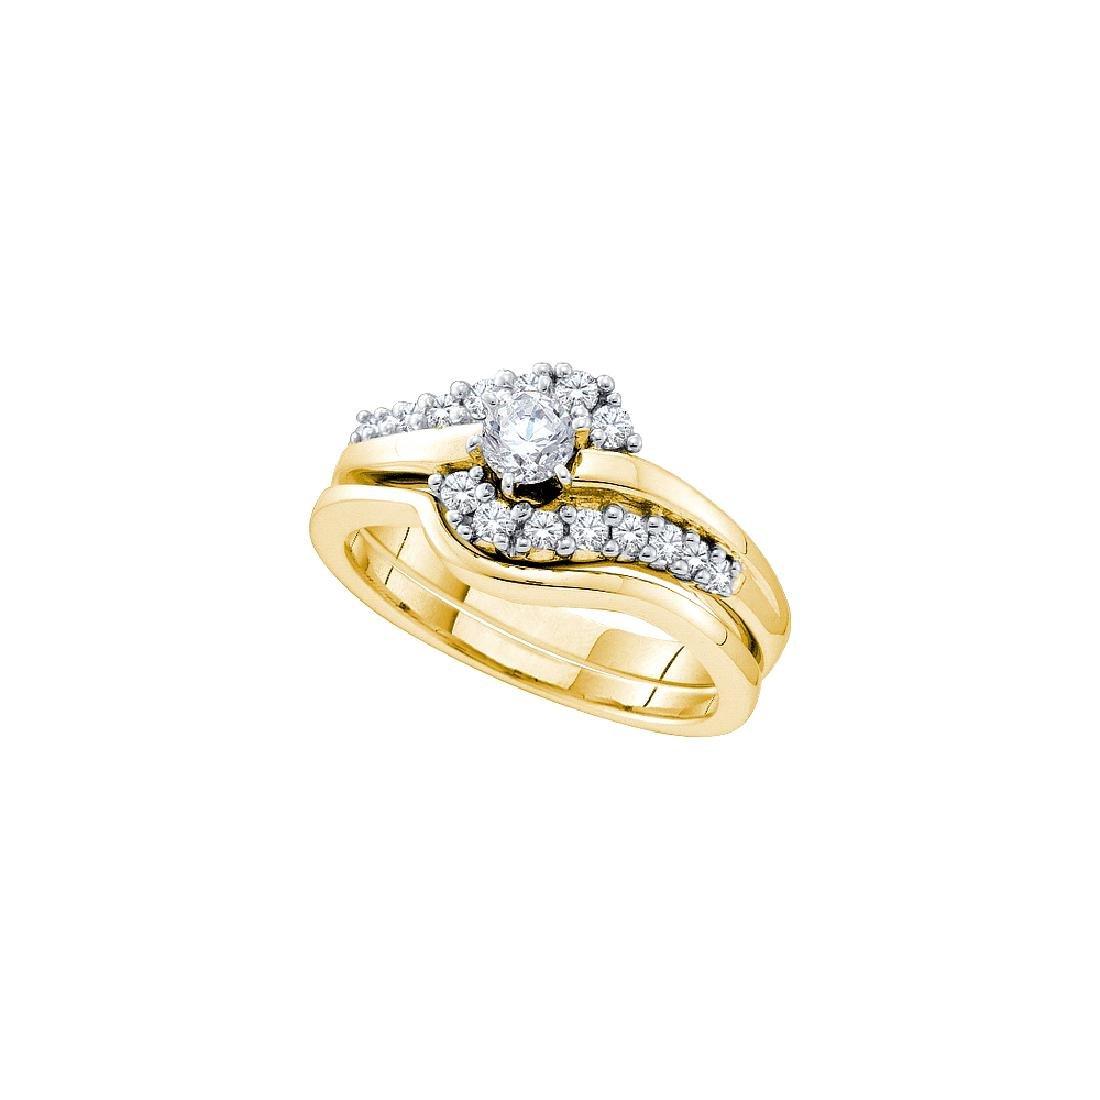 0.5 CTW Natural Diamond .20 Carat Solitaire Bridal Ring